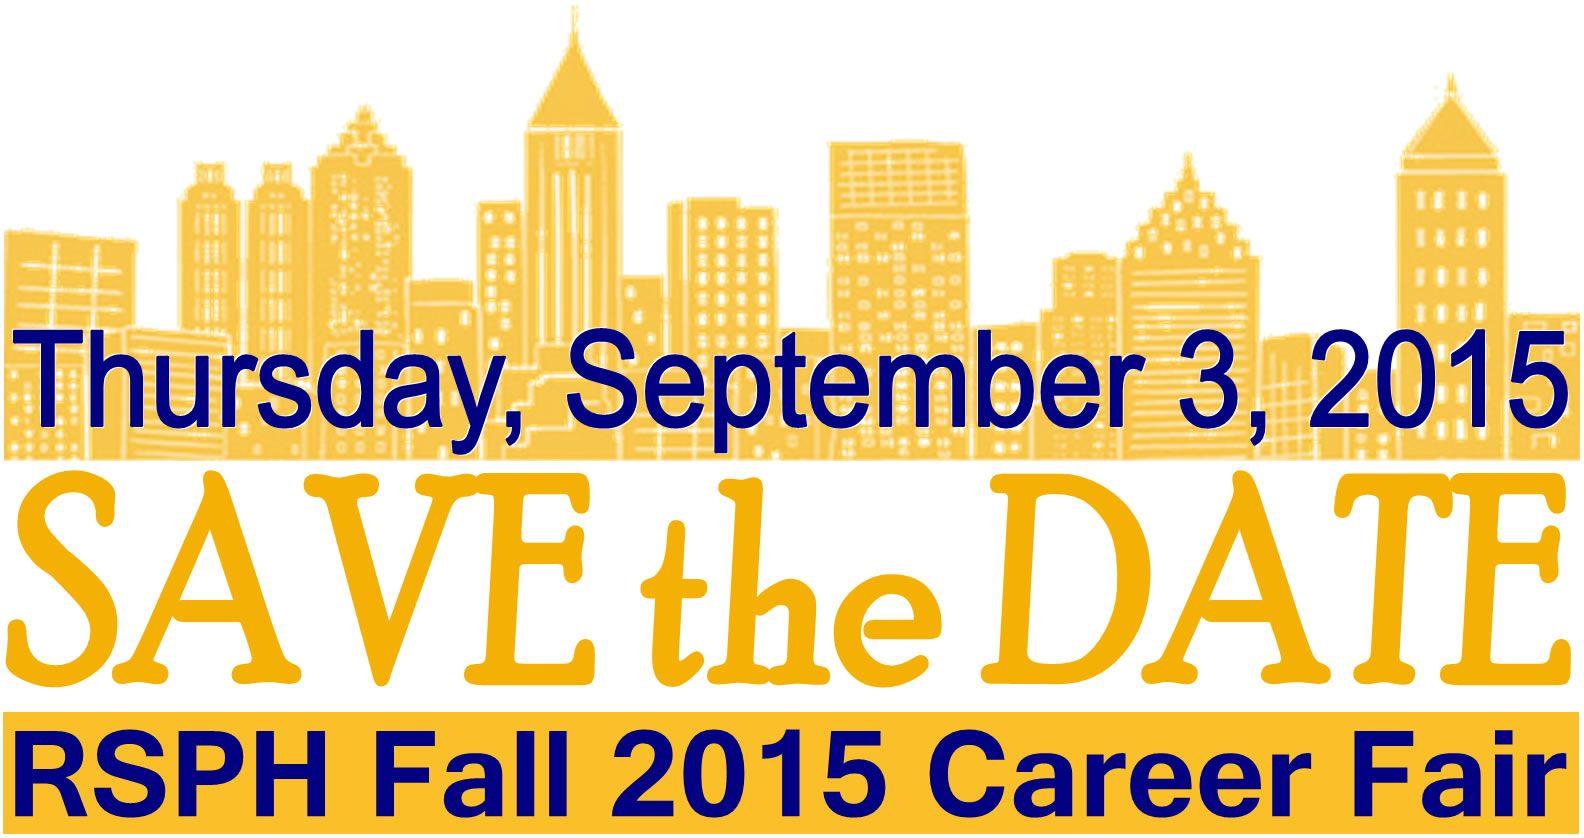 http//sph.emory.edu/careers/featuredservices/careerfair